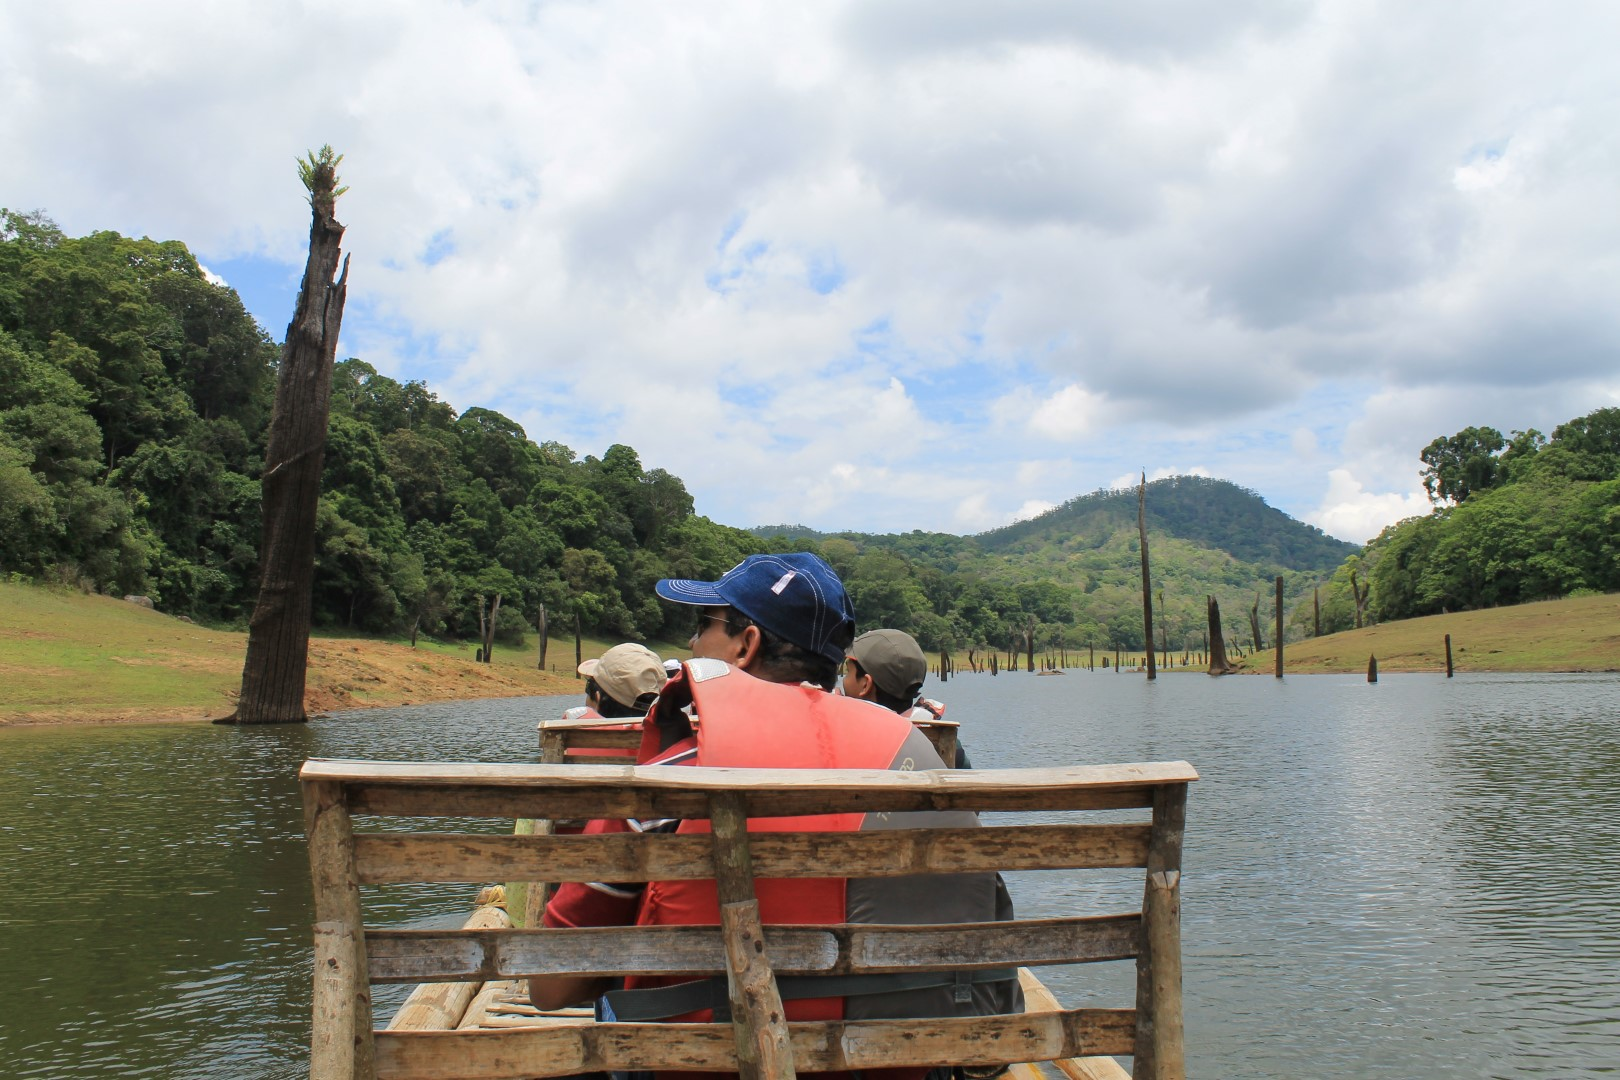 Bamboo Rafting after Jungle Trekking in Thekkady, Kerala, India.